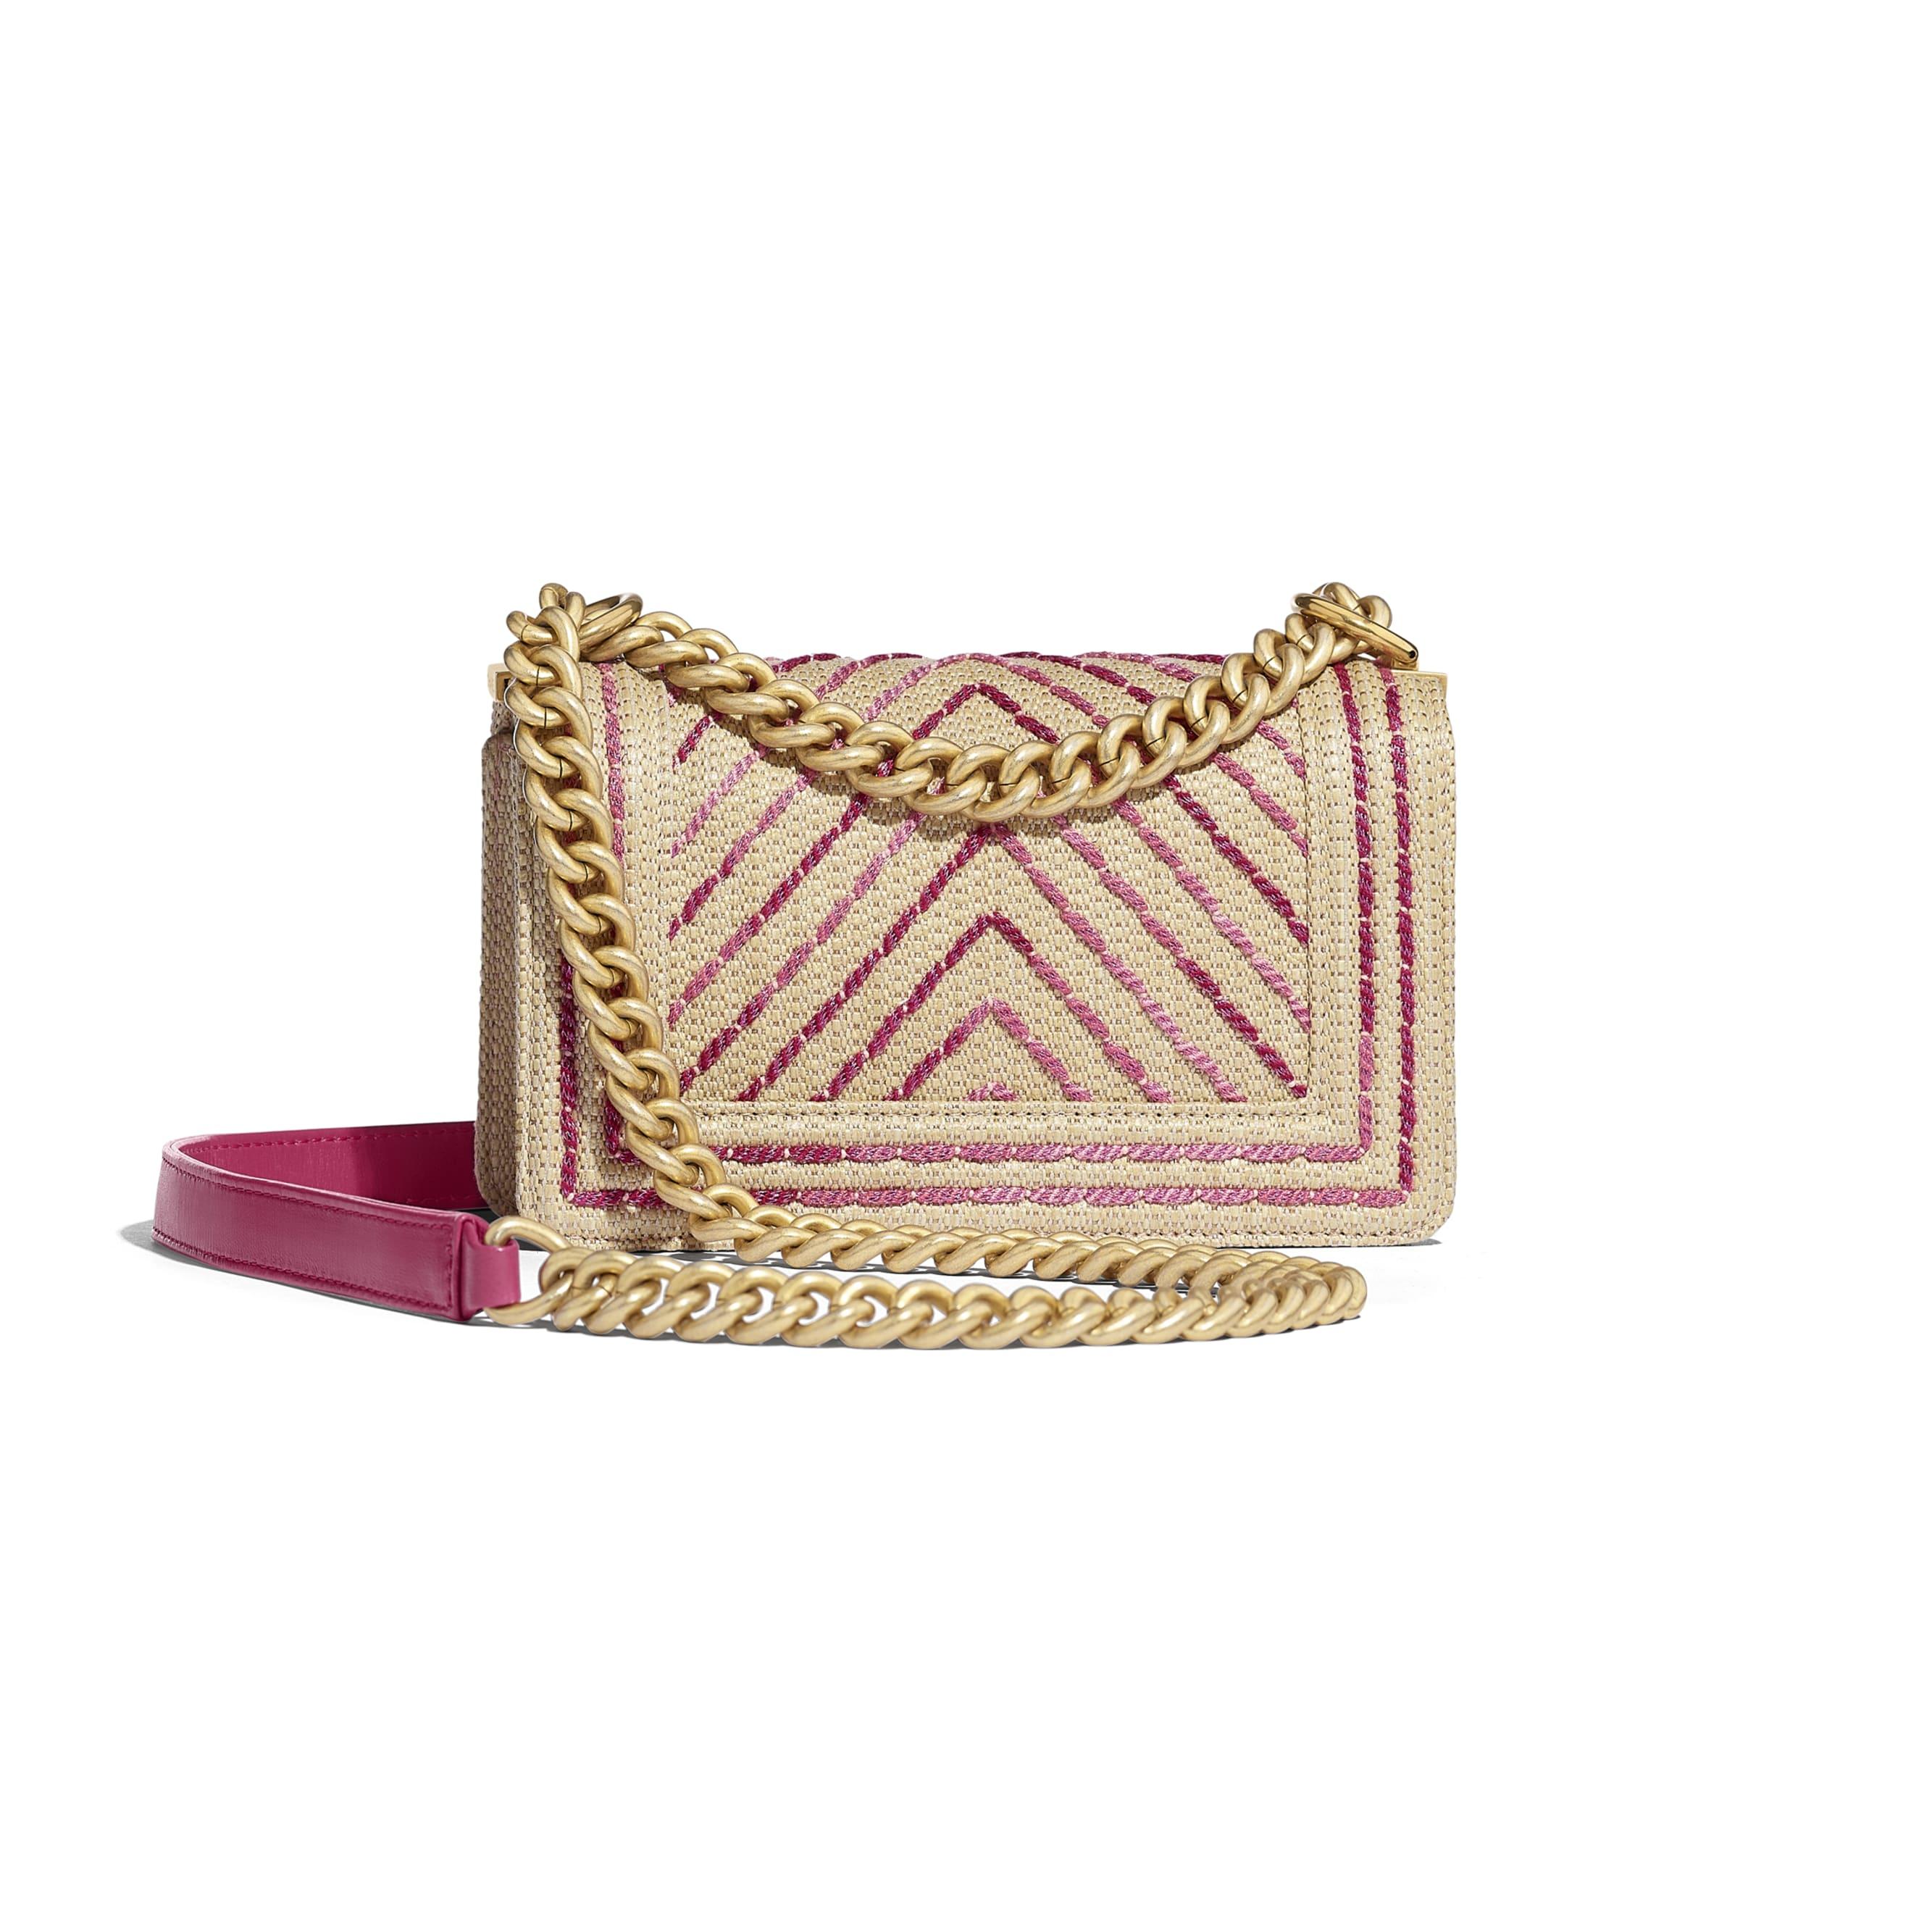 Small BOY CHANEL Handbag - Beige & Pink - Cotton, Mixed Fibers, Calfskin & Gold-Tone Metal - Alternative view - see standard sized version